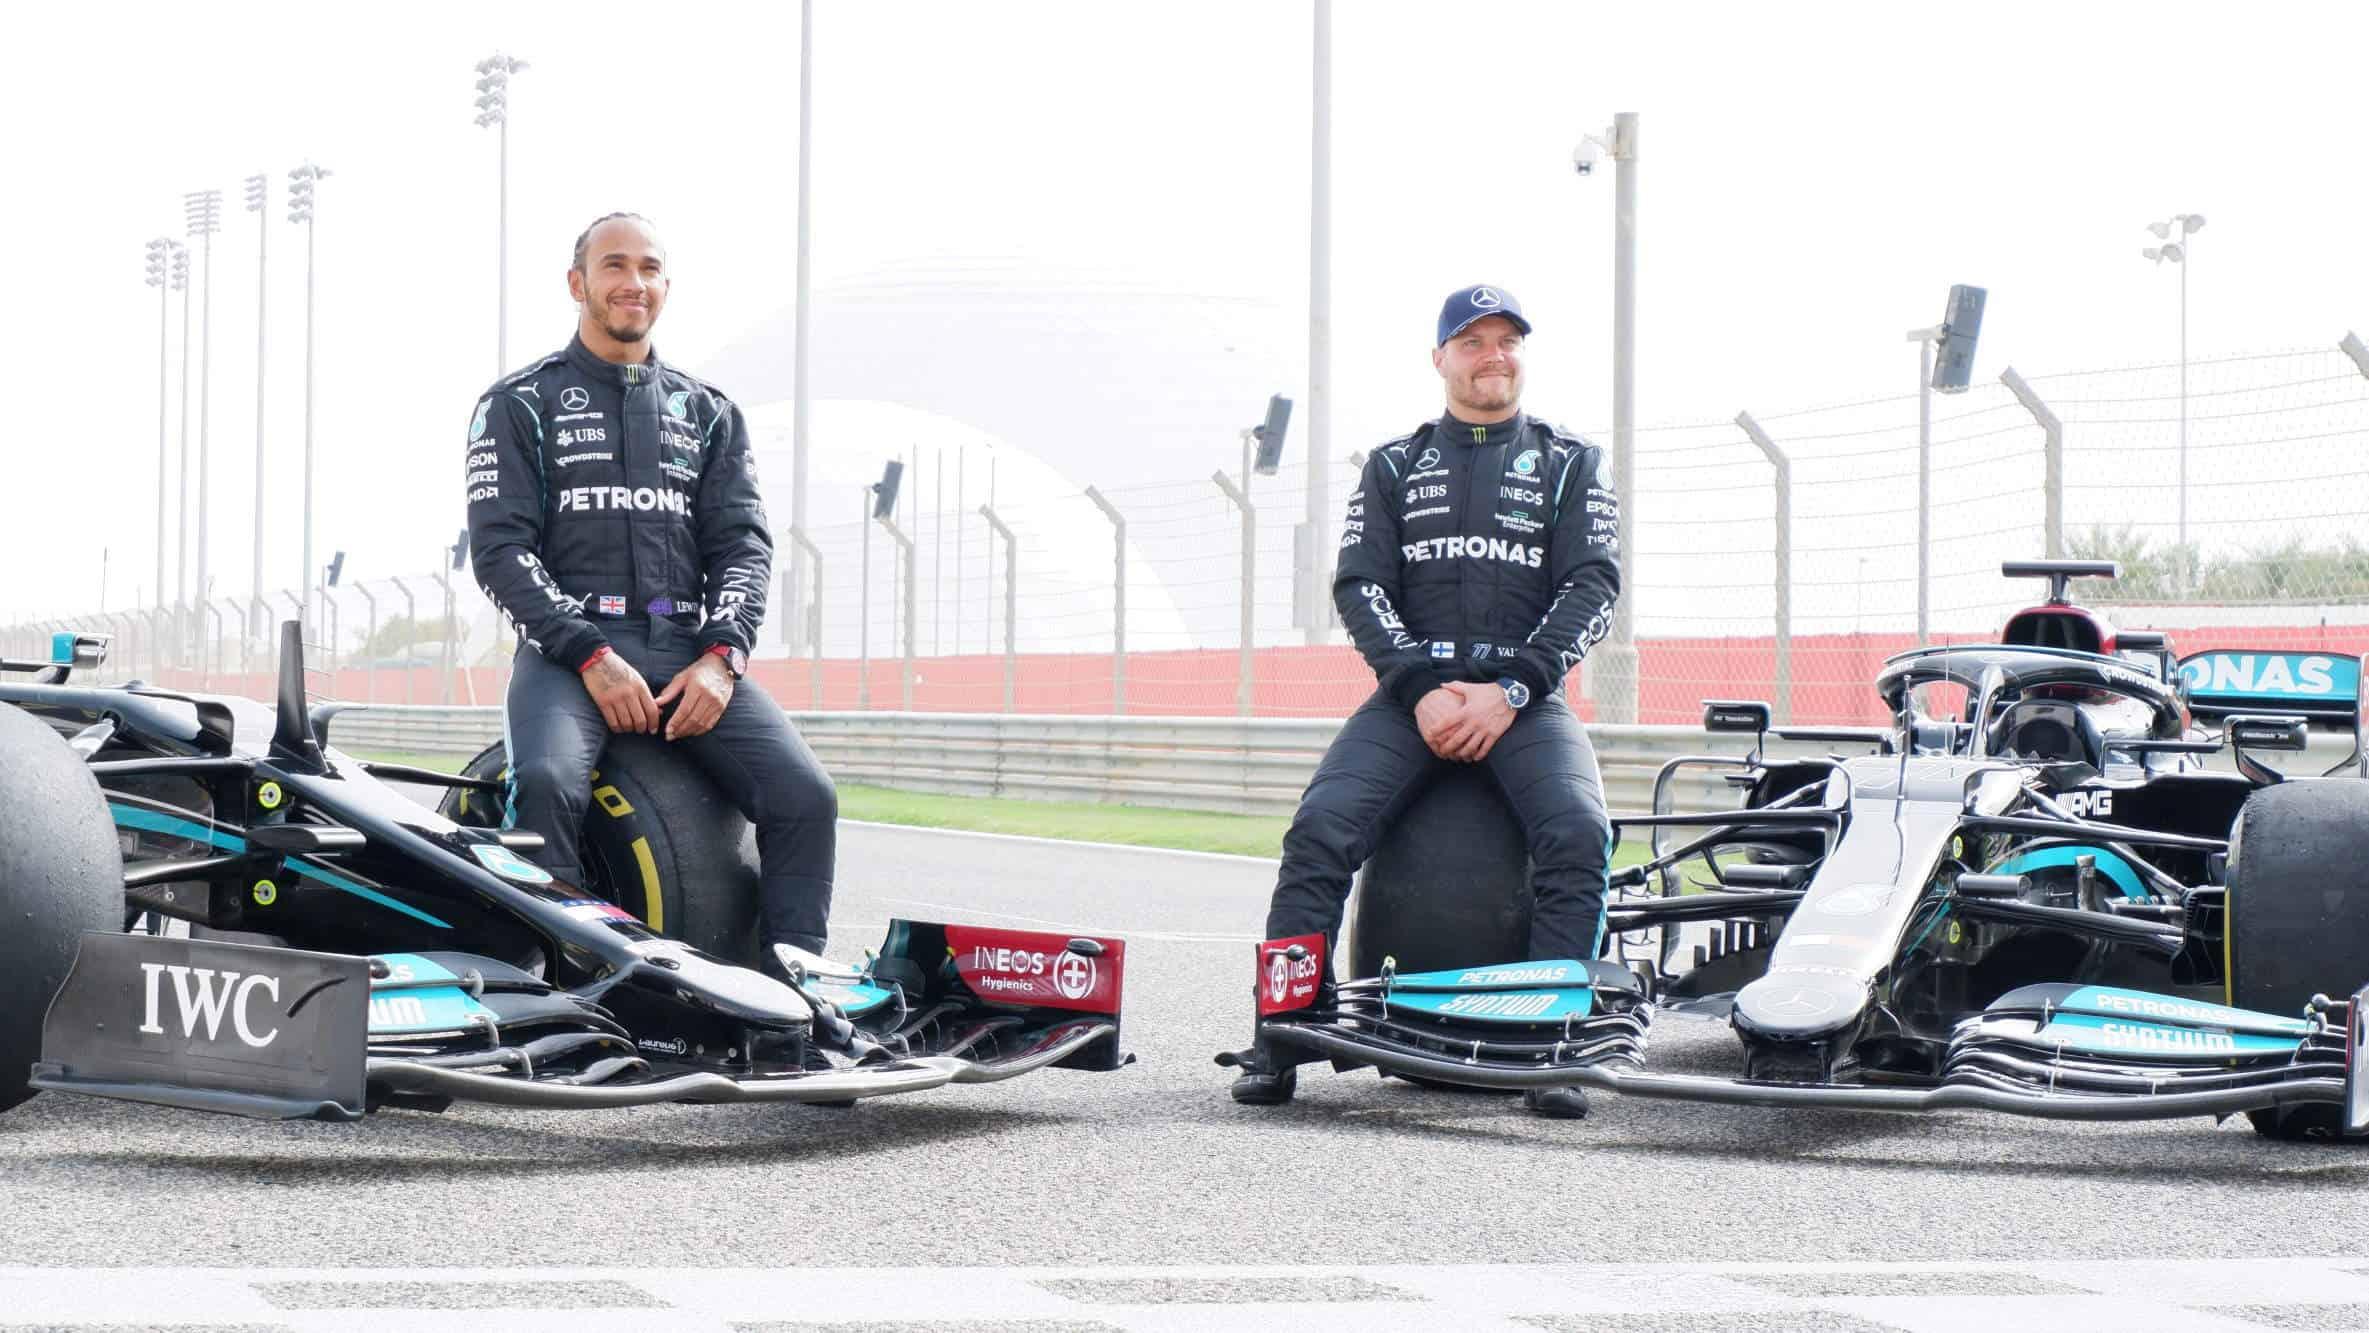 2021 Bahrain F1 Mercedes private test filming day Hamilton Bottas pose with their cars Photo Daimler